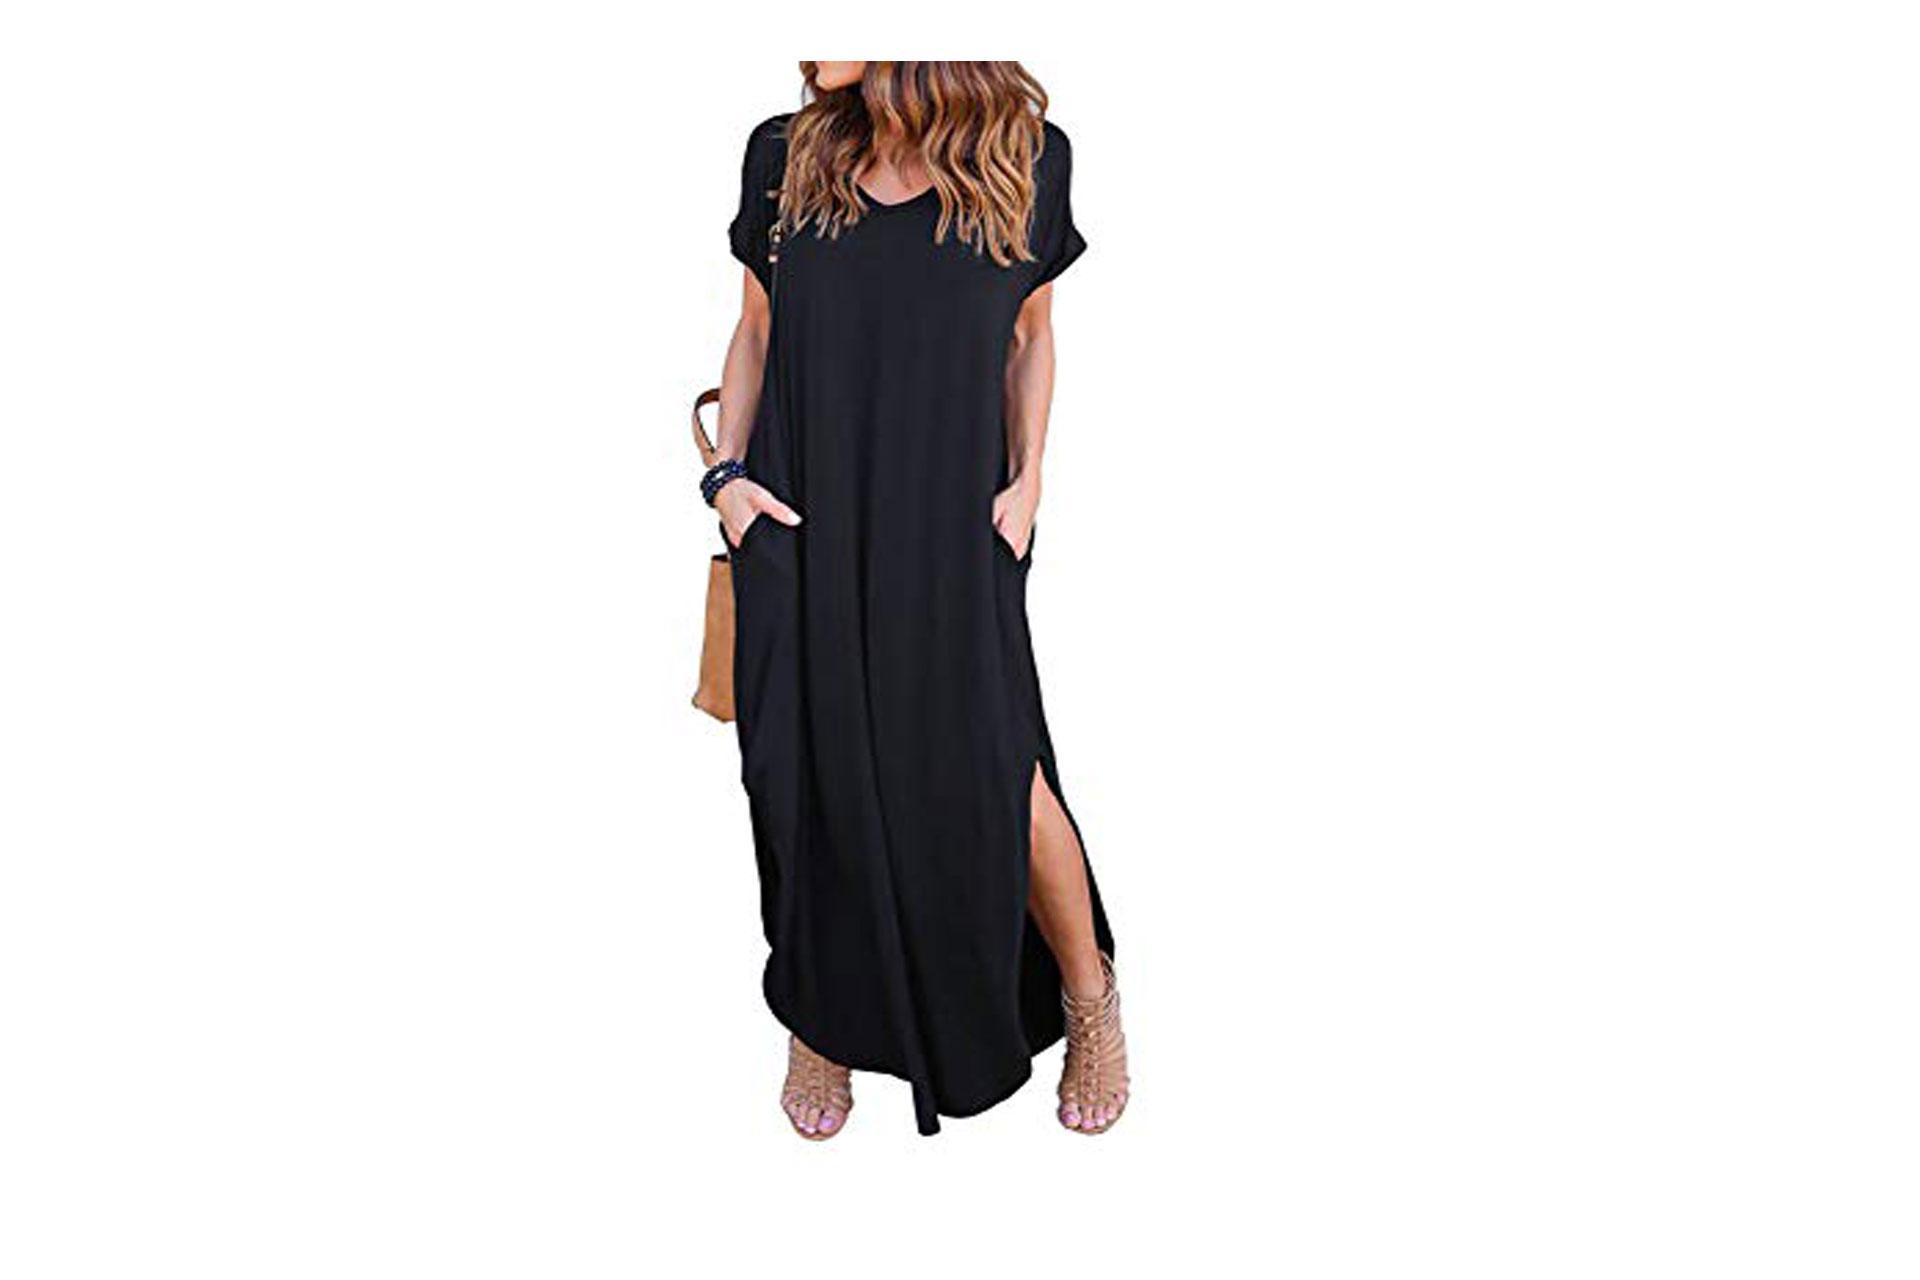 Women's Black Dress; Courtesy of Amazon